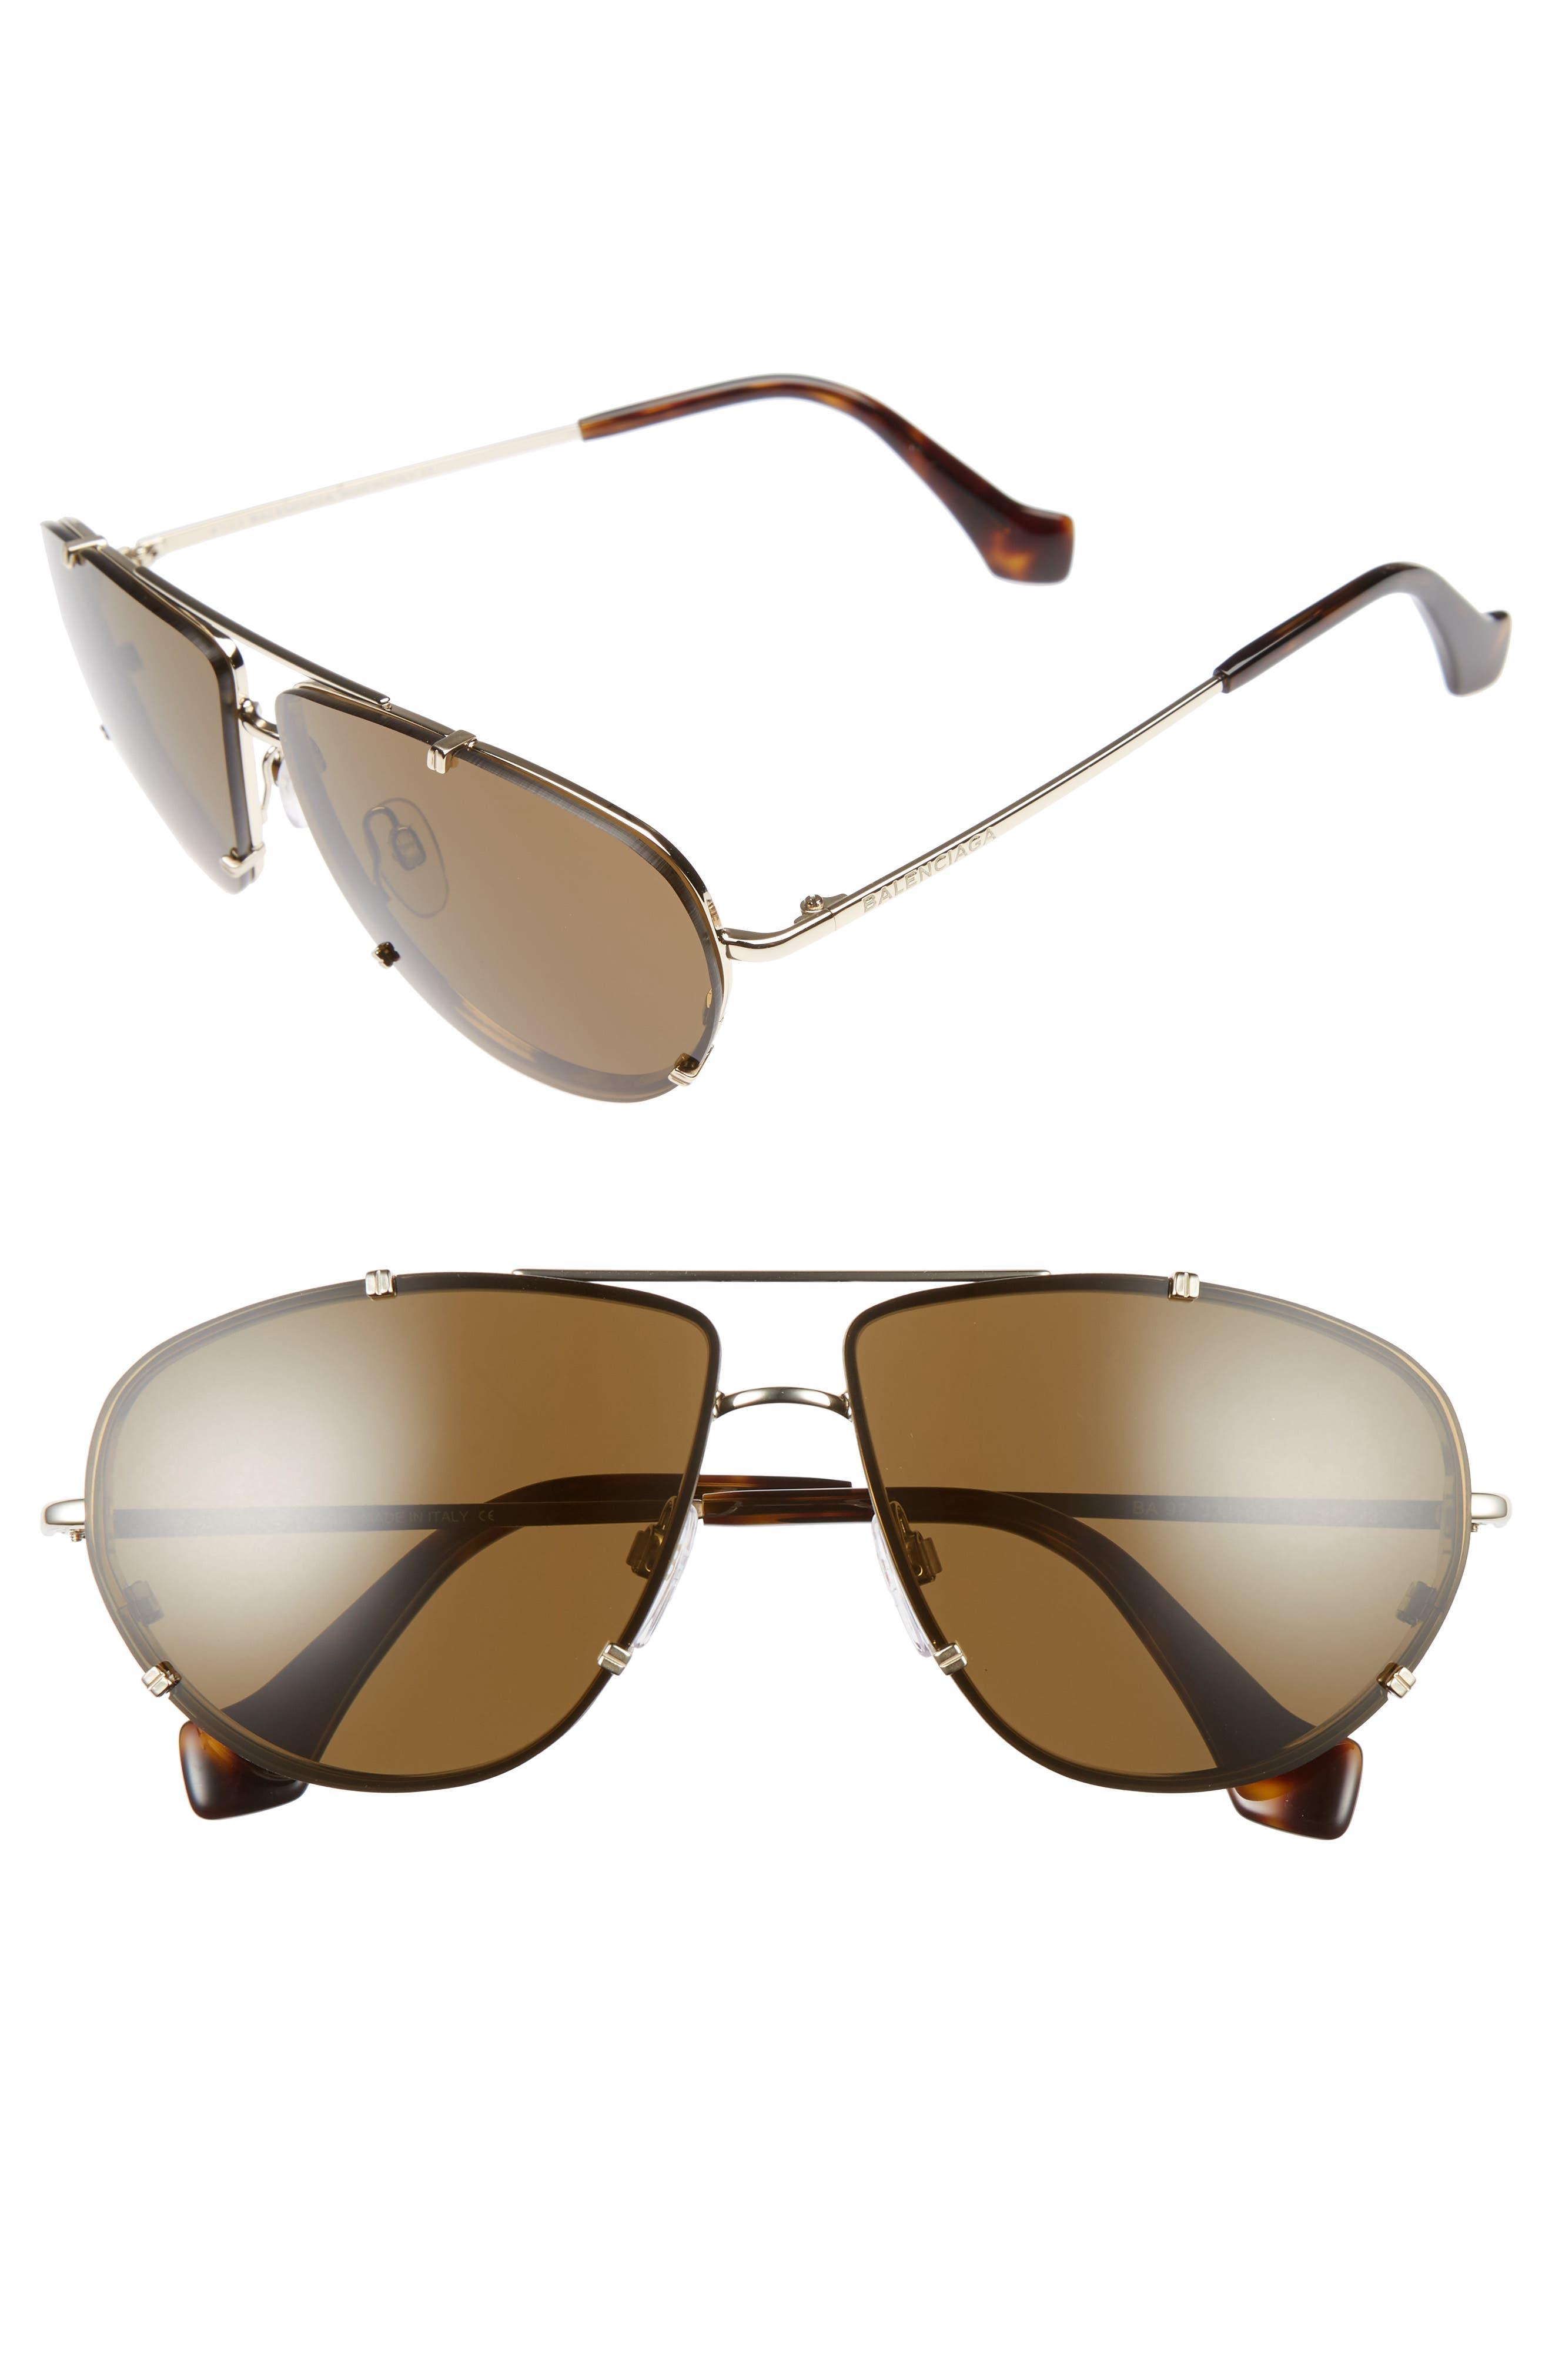 Main Image - Balenciaga 62mm Aviator Sunglasses